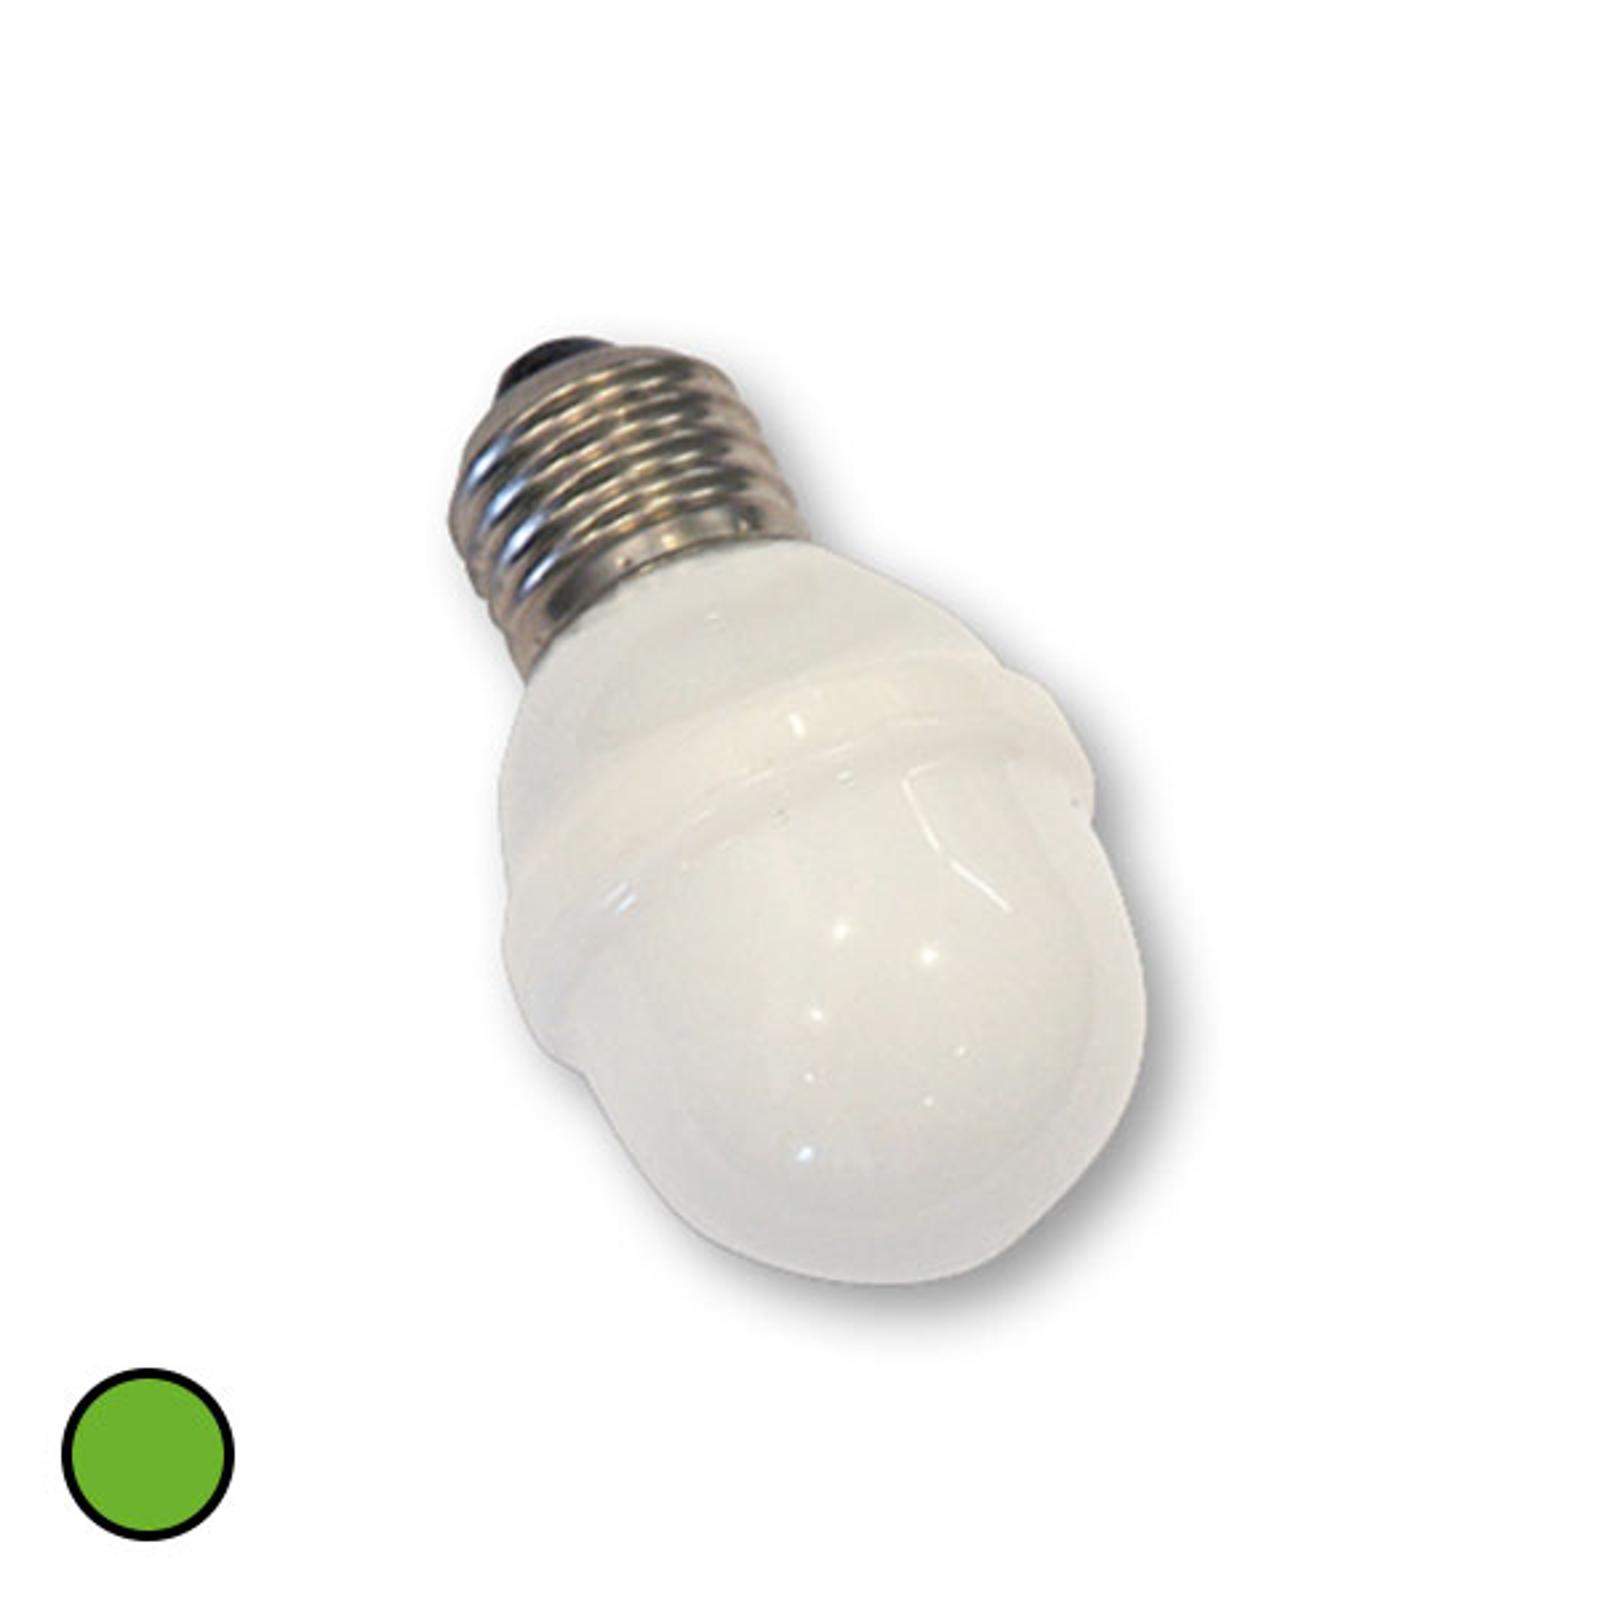 E27 Golfball-Lampe 1W 5,5 VA grün